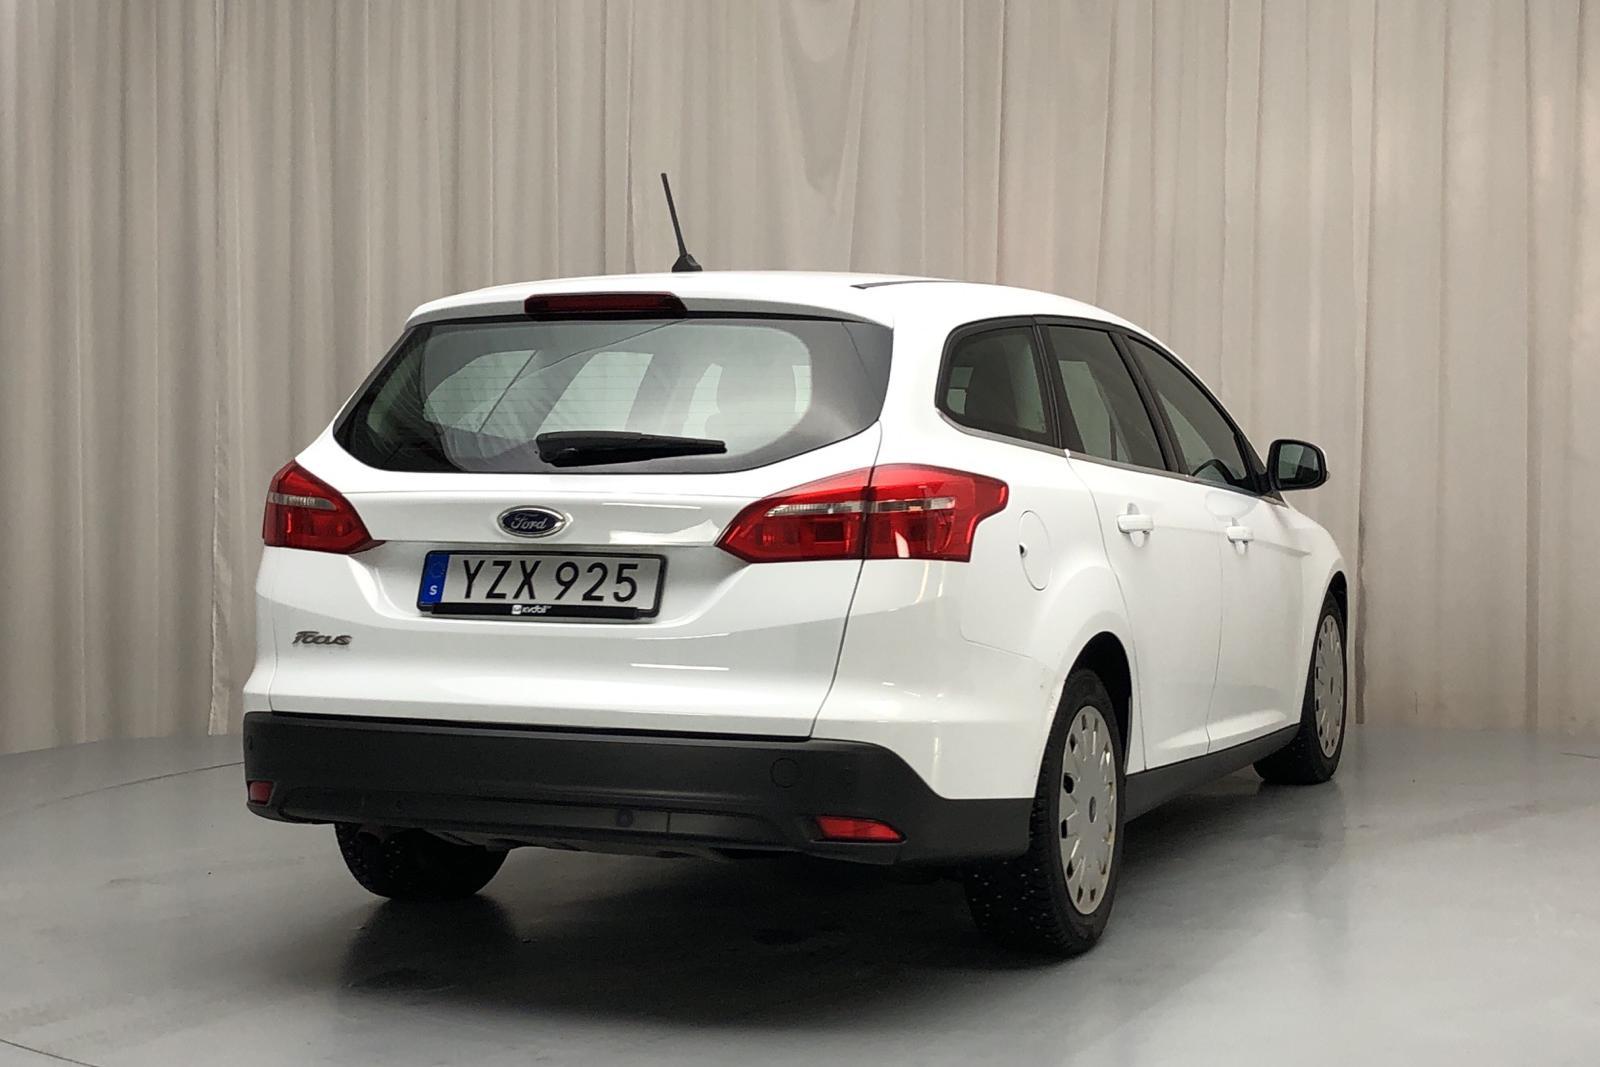 Ford Focus 1.5 TDCi ECOnetic Kombi (105hk) - 80 100 km - Manual - white - 2018